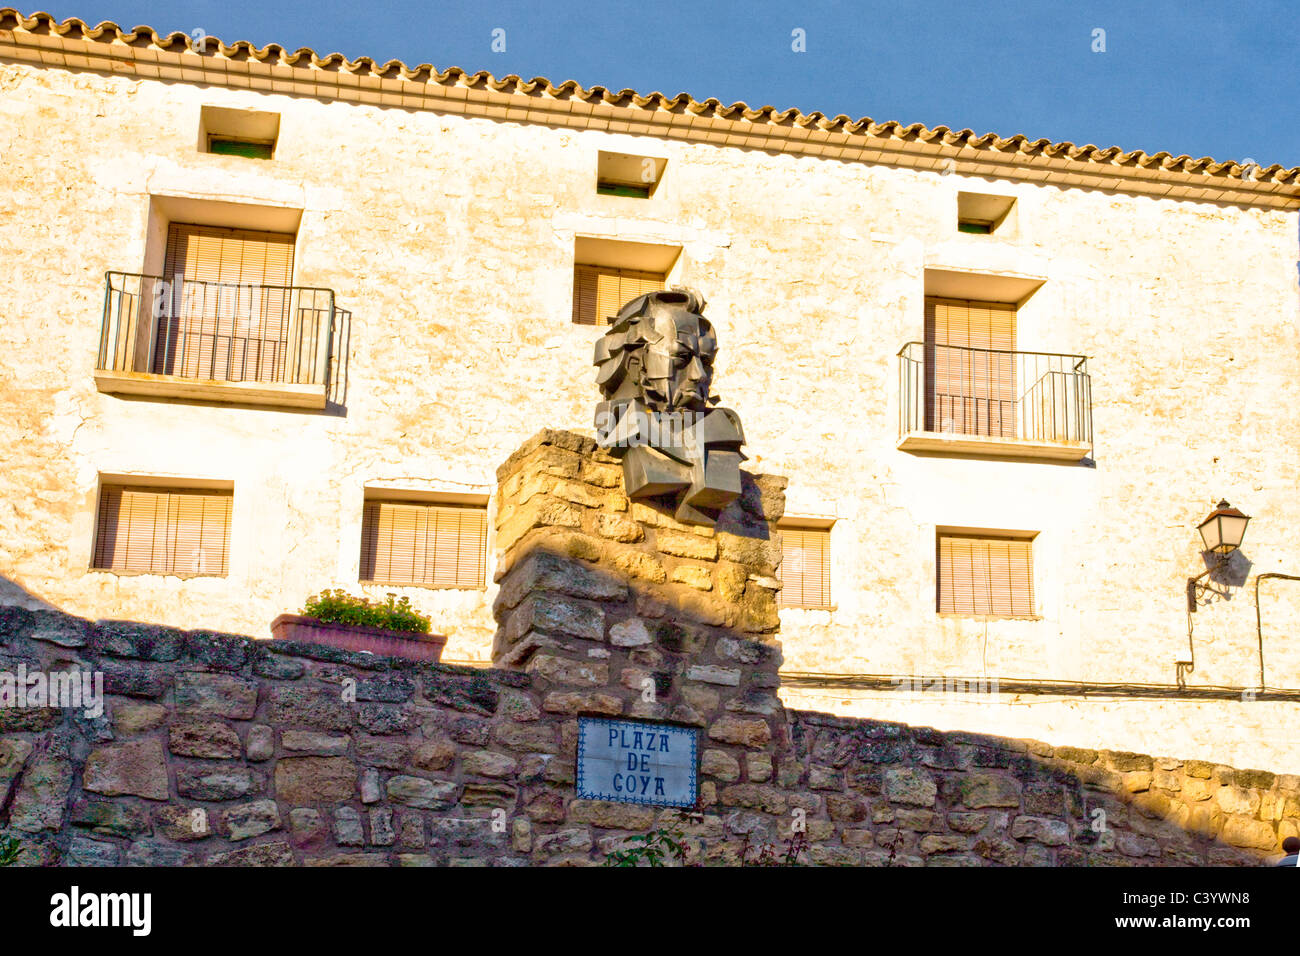 Spain, Europe, Aragon, Fuendetodos, Goya, plastic, - Stock Image